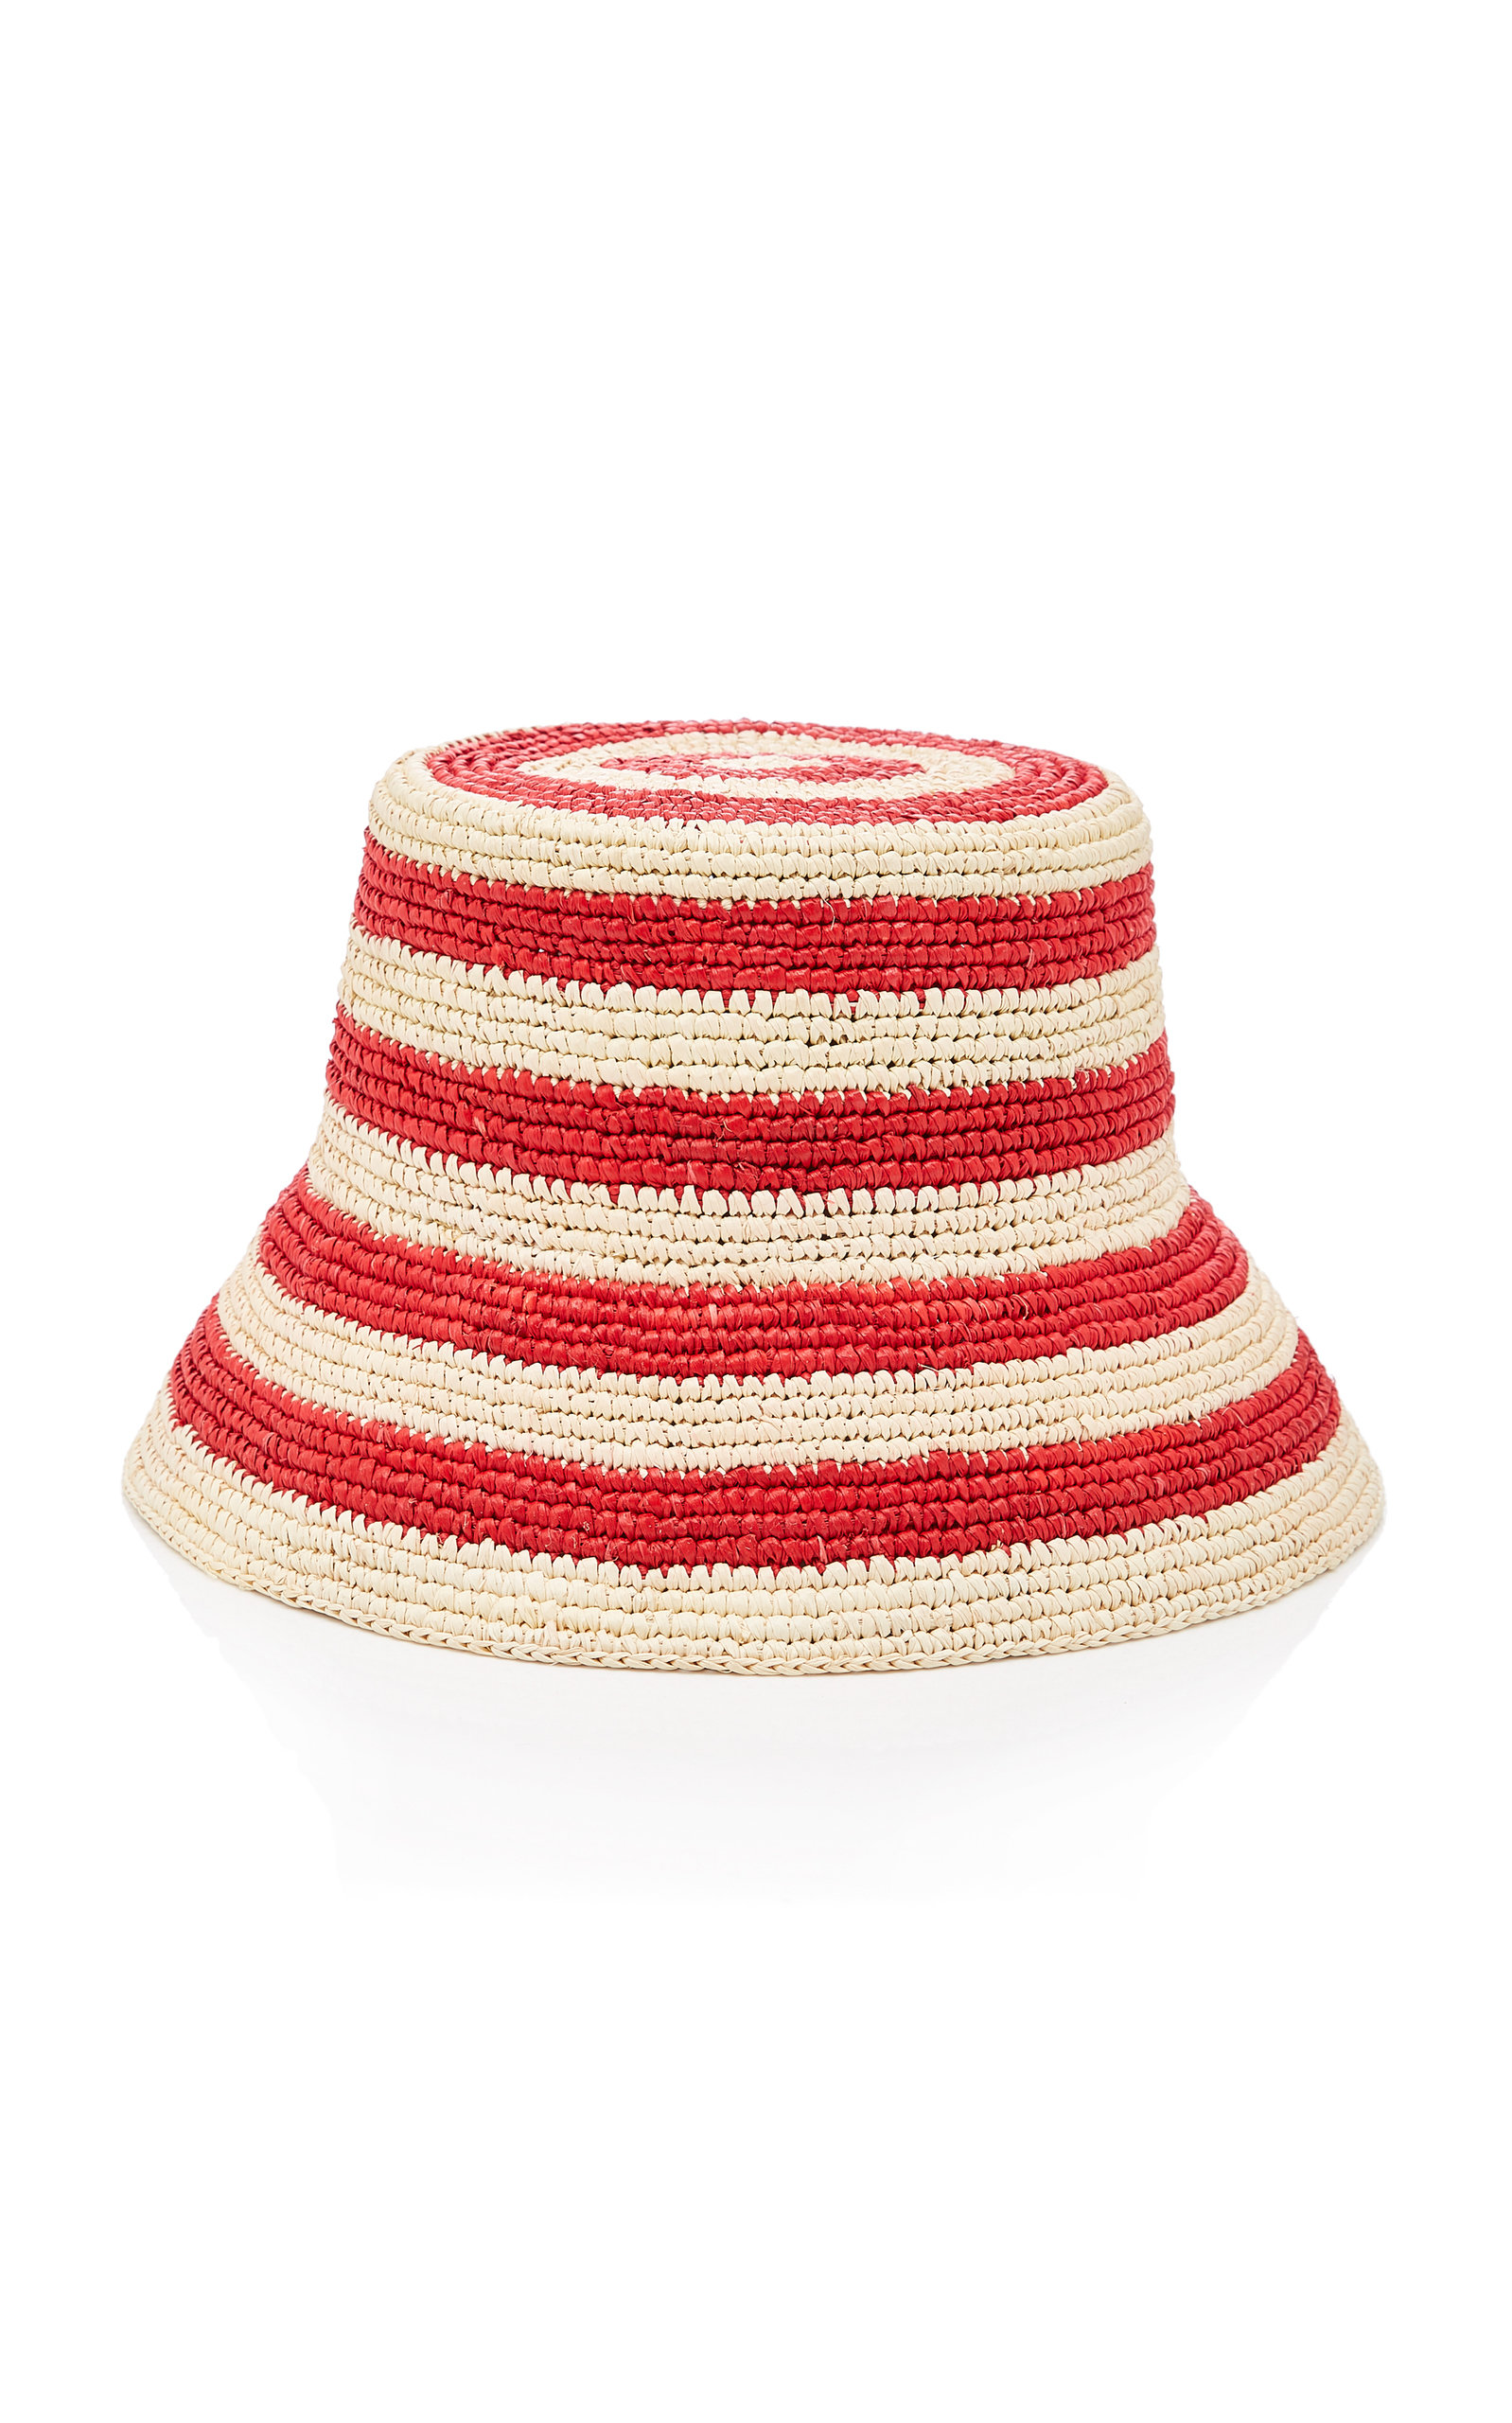 b89a641afe62ba Exclusive Striped Straw Bucket Hat by Sensi Studio | Moda Operandi